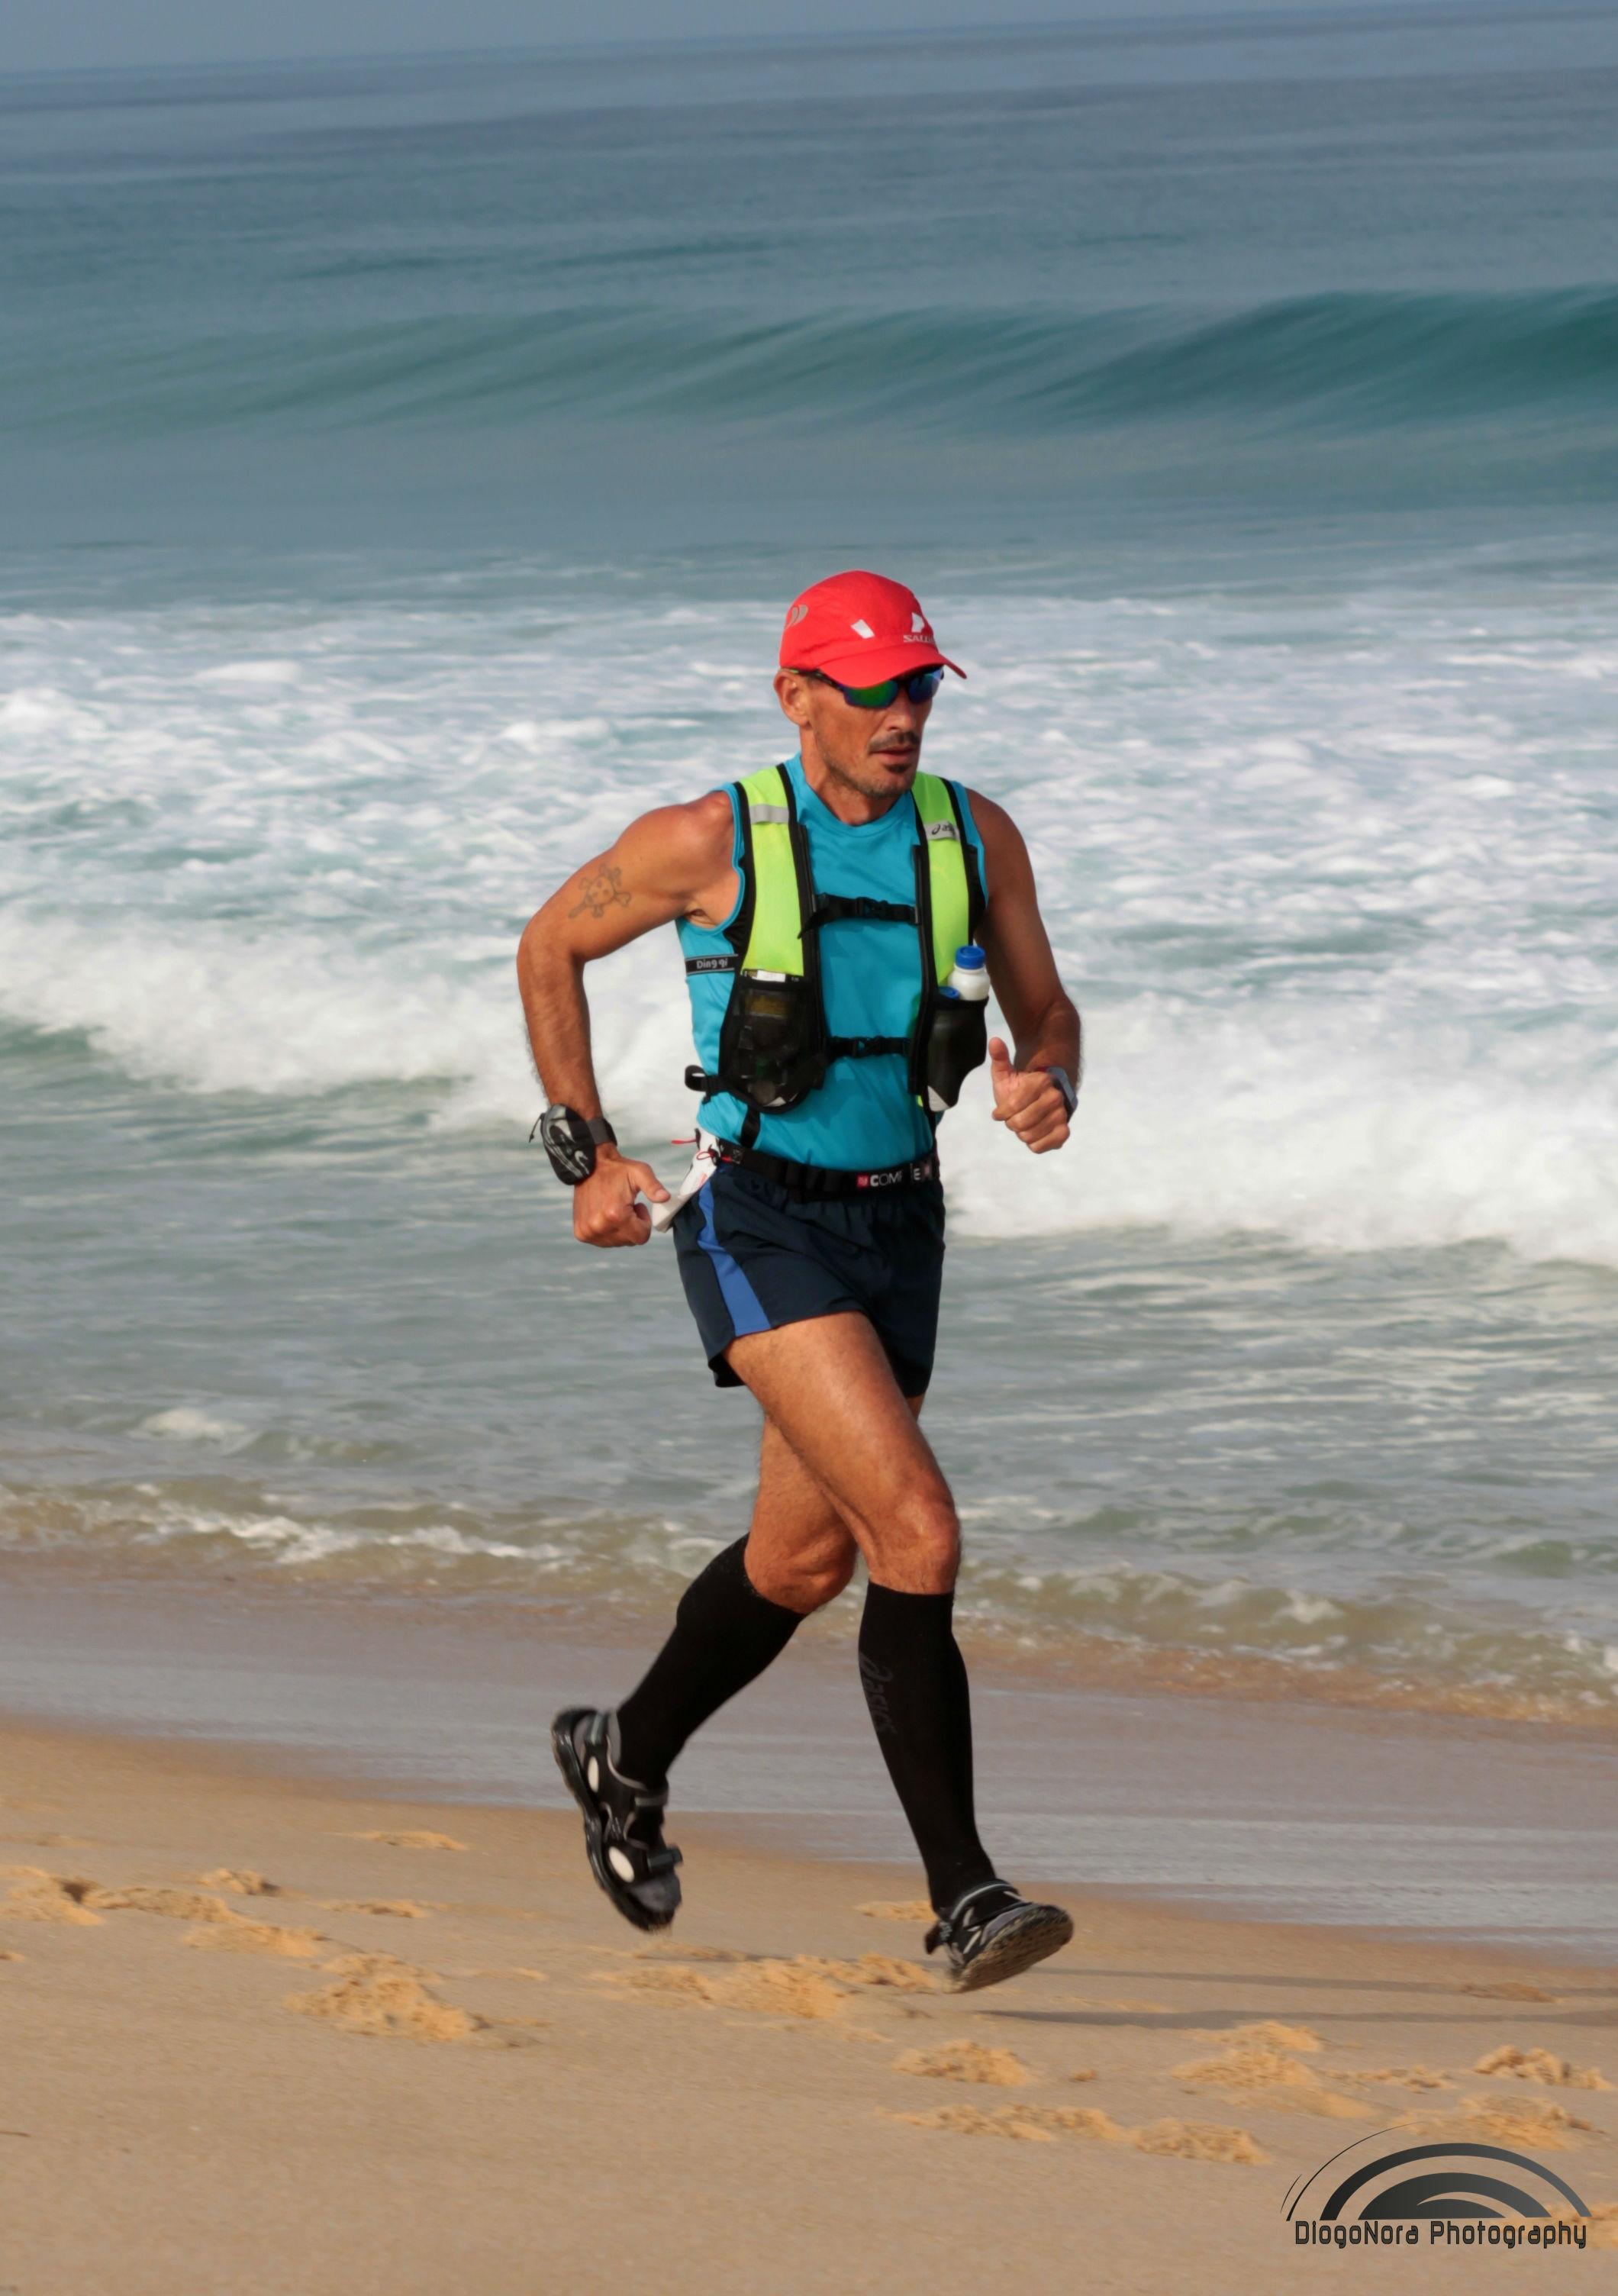 foto-3-jaime-lamego-uma-ultra-maratona-atlantica